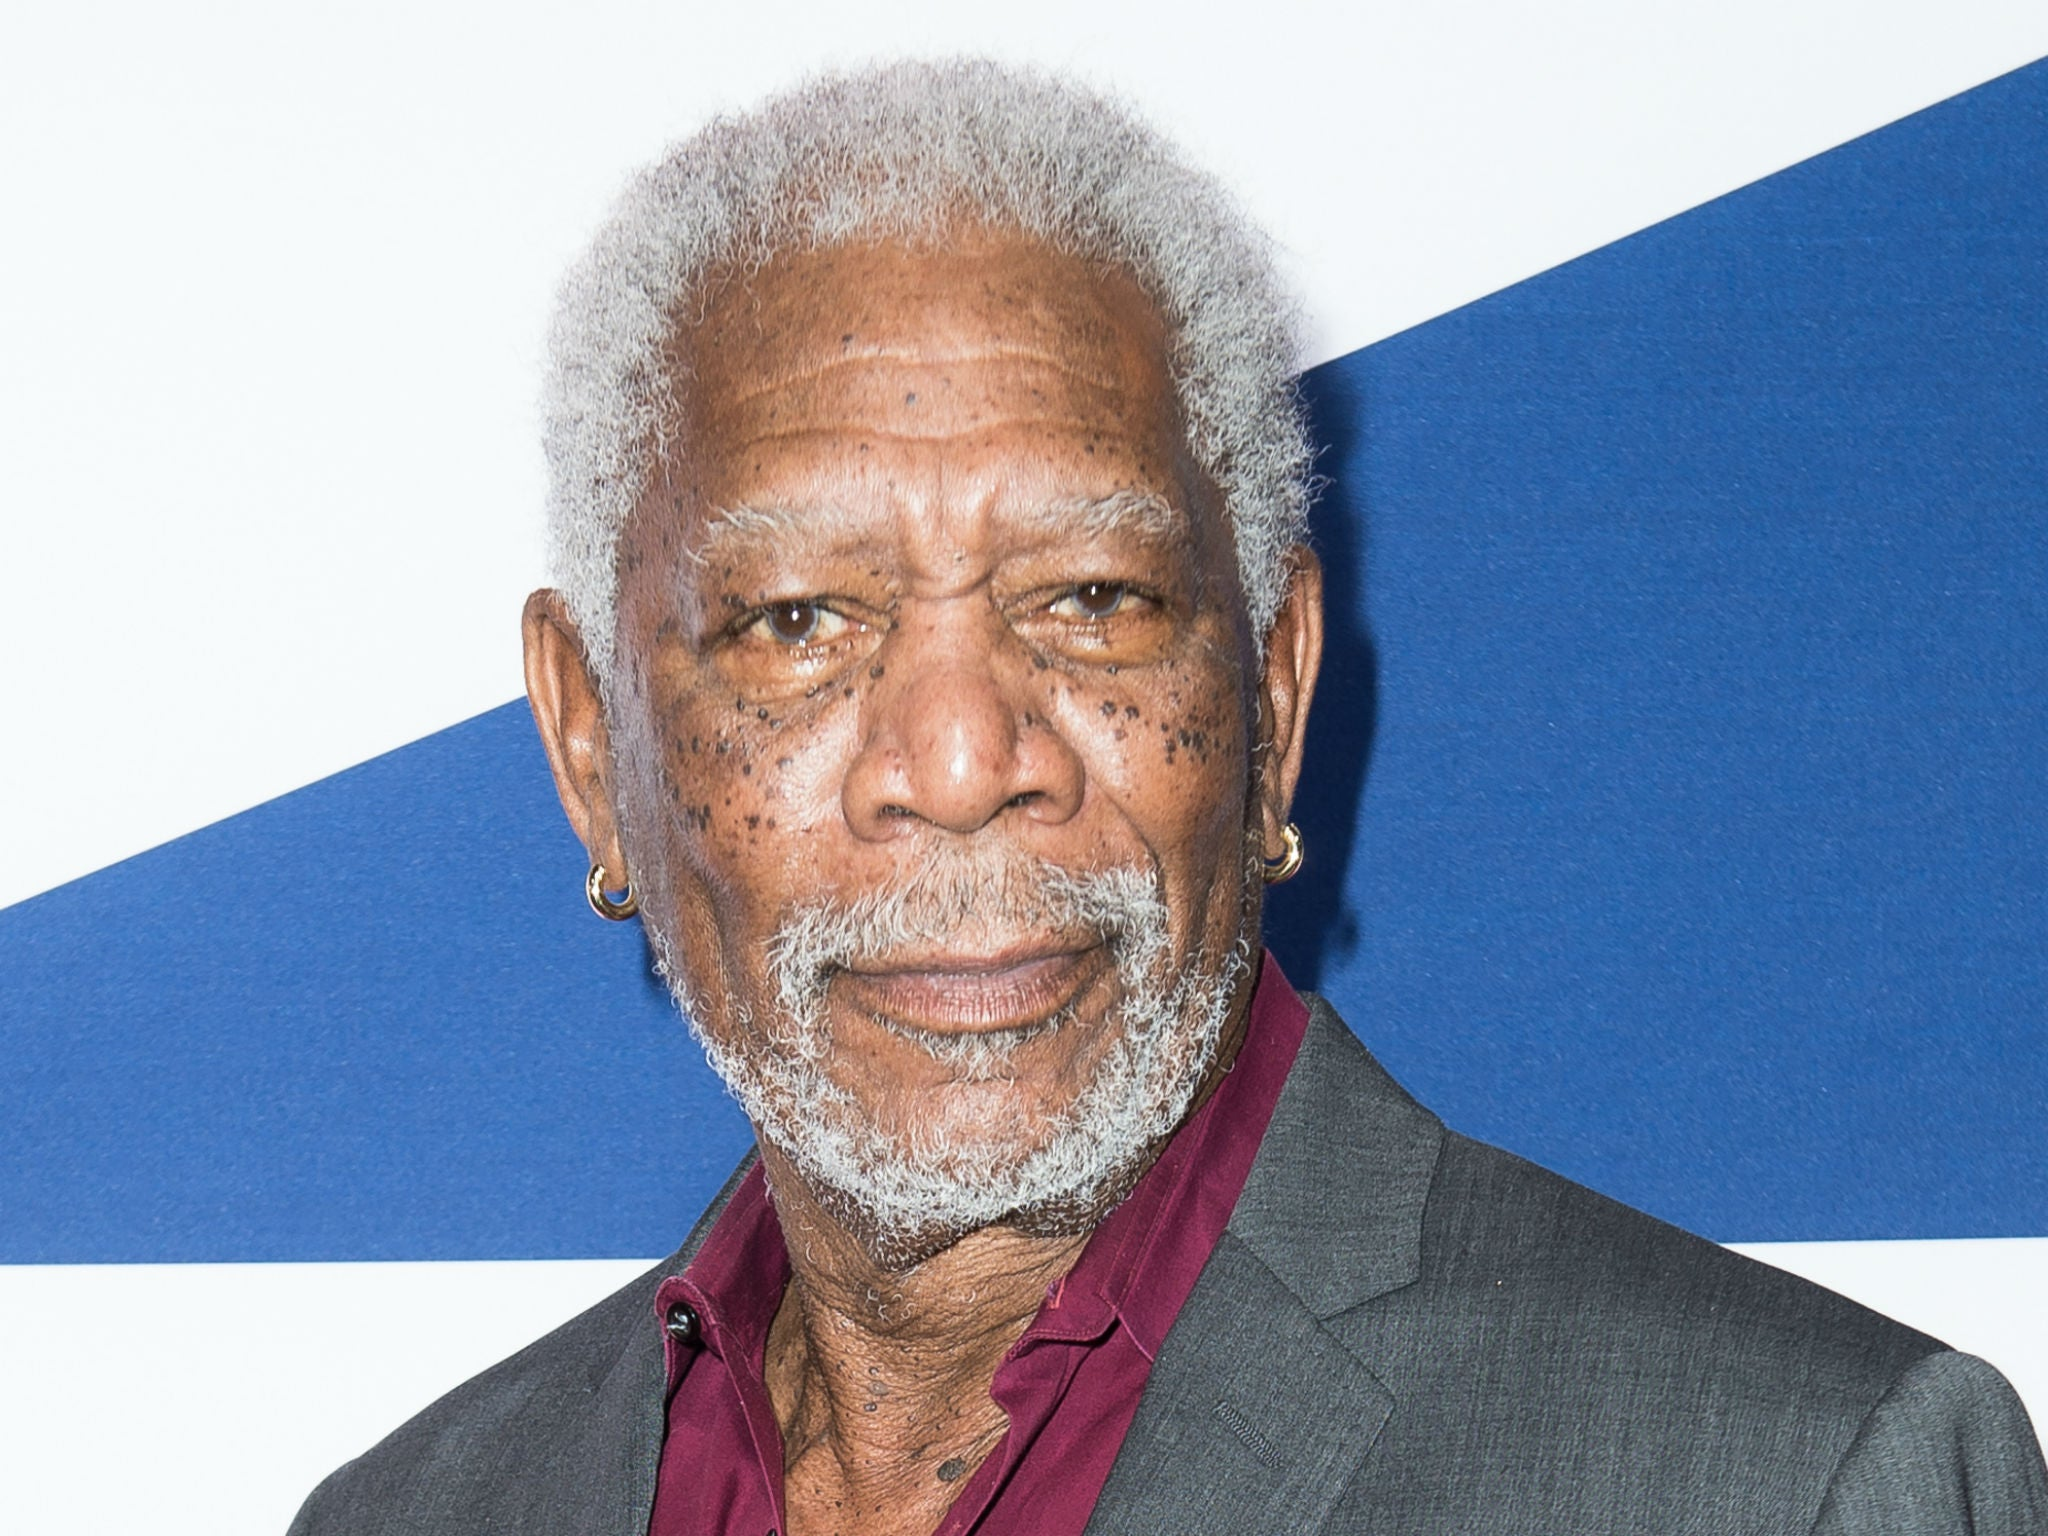 Morgan Freeman Explains How He Got His Iconic Voice